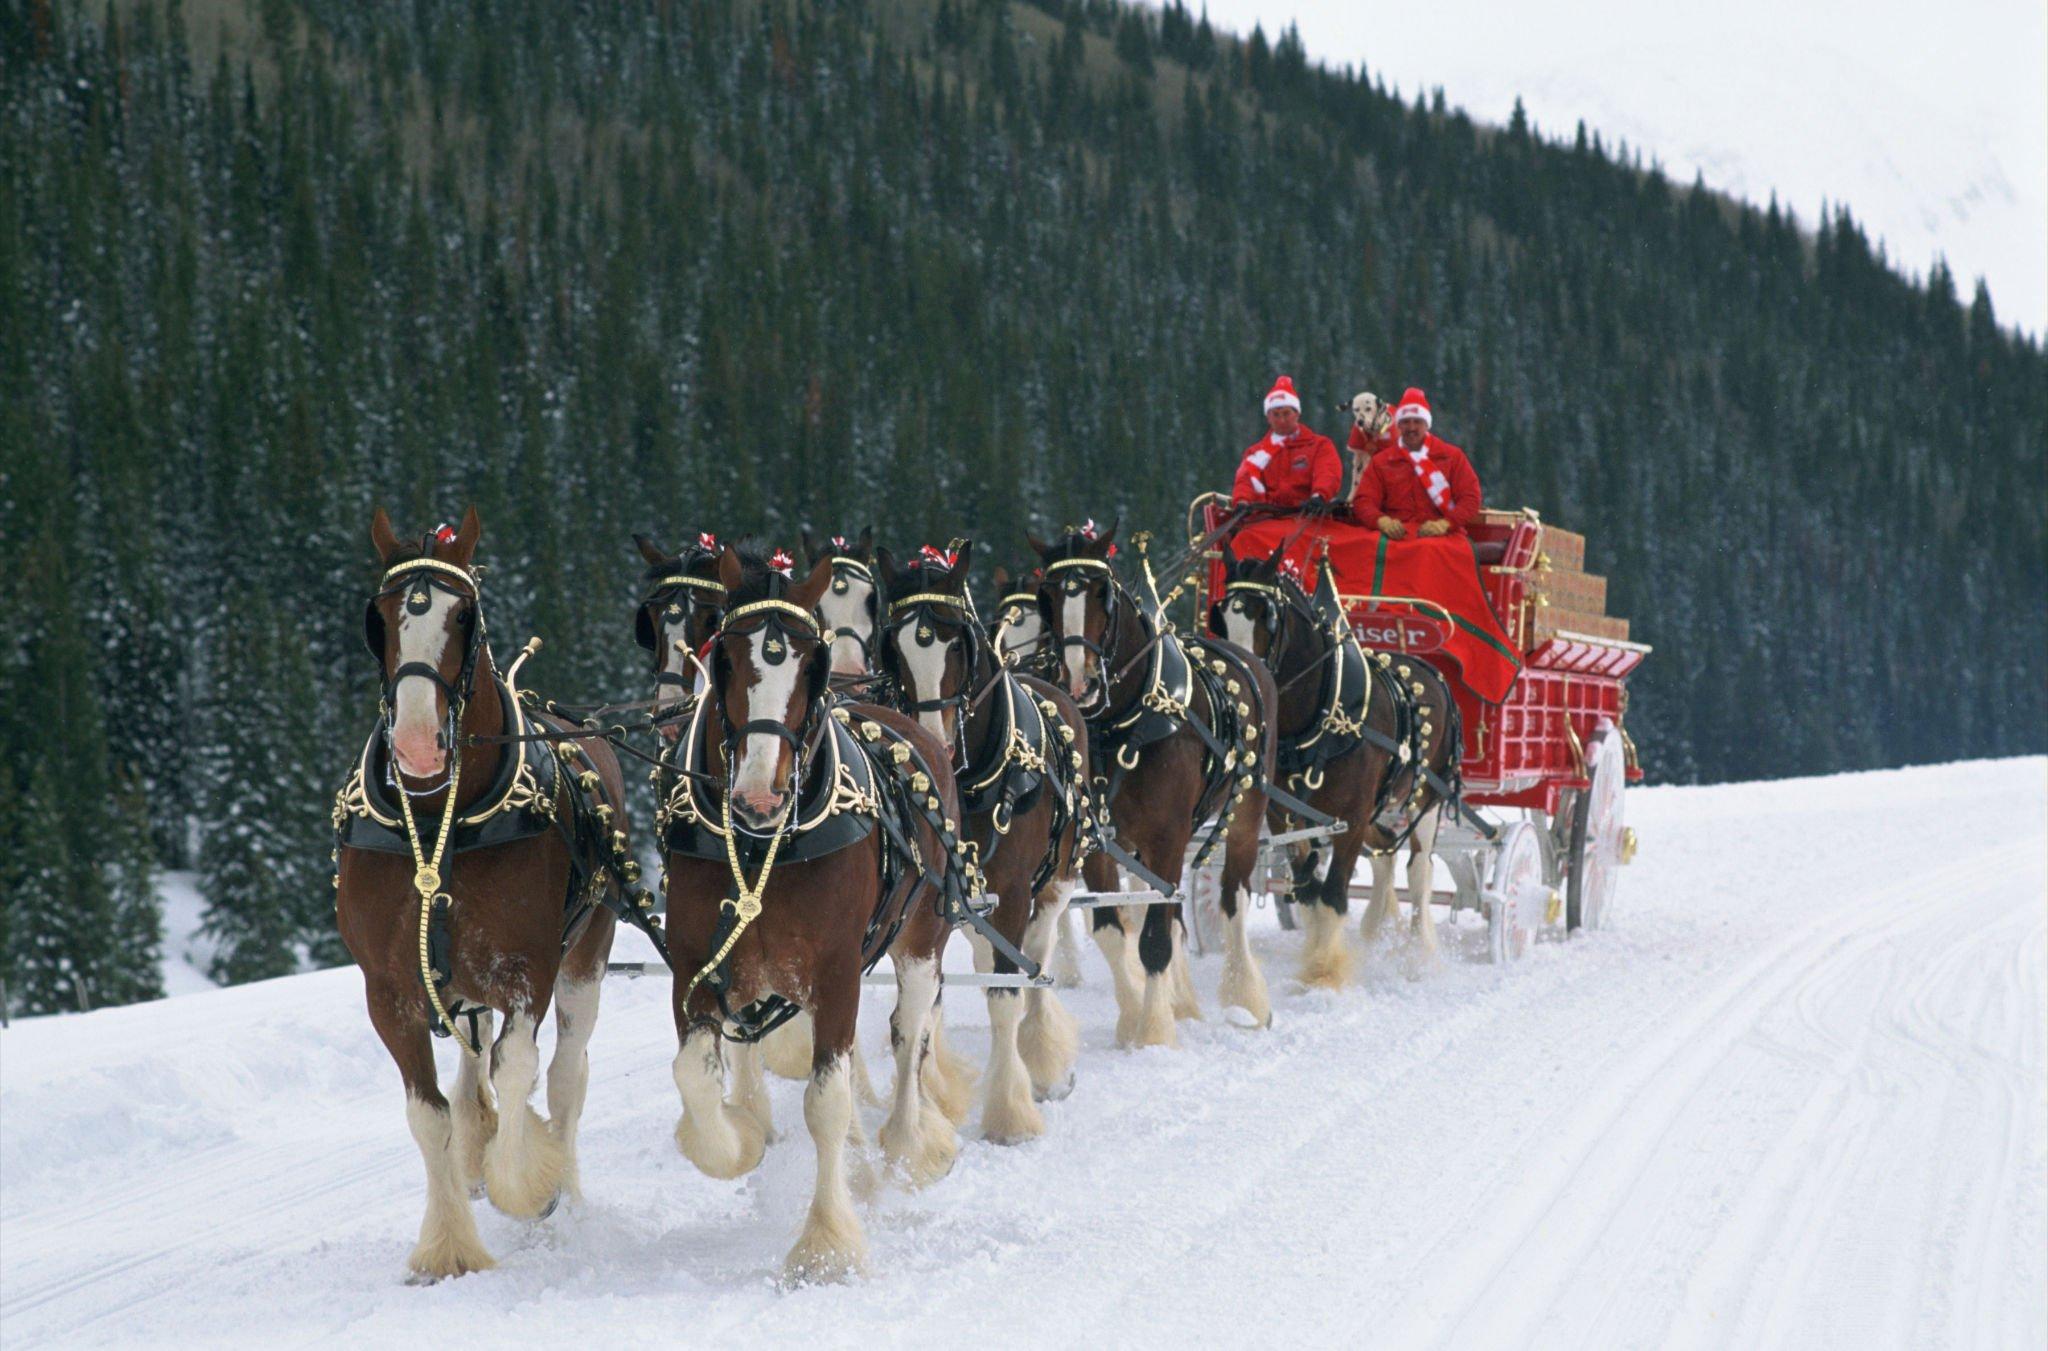 christmas sleigh horses 1920x1080 wallpaper - photo #39